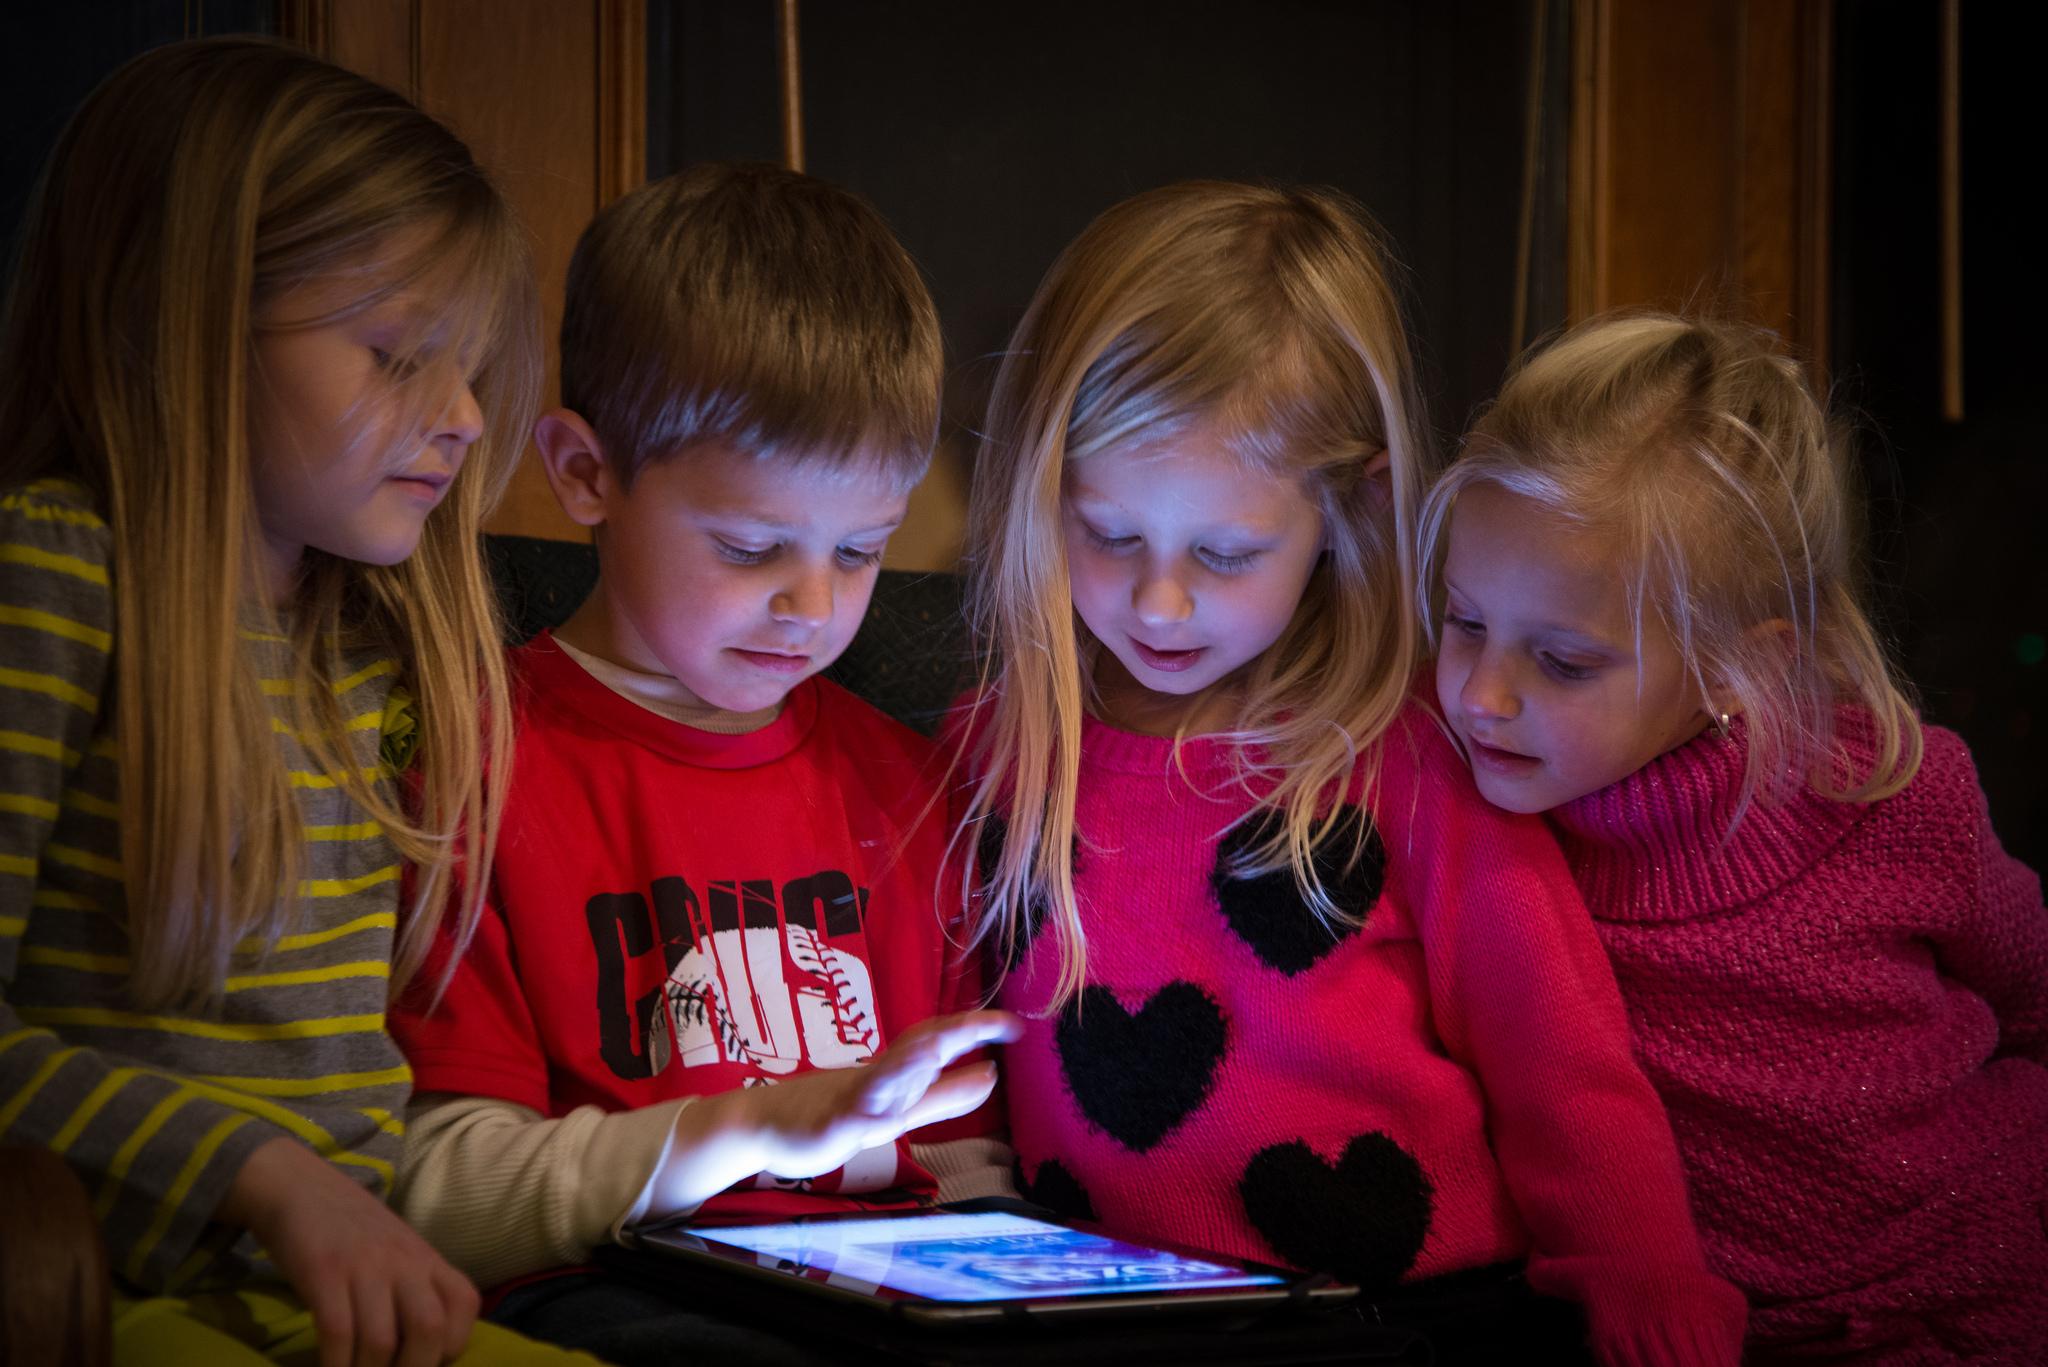 kidstech-jim bauer via flickr